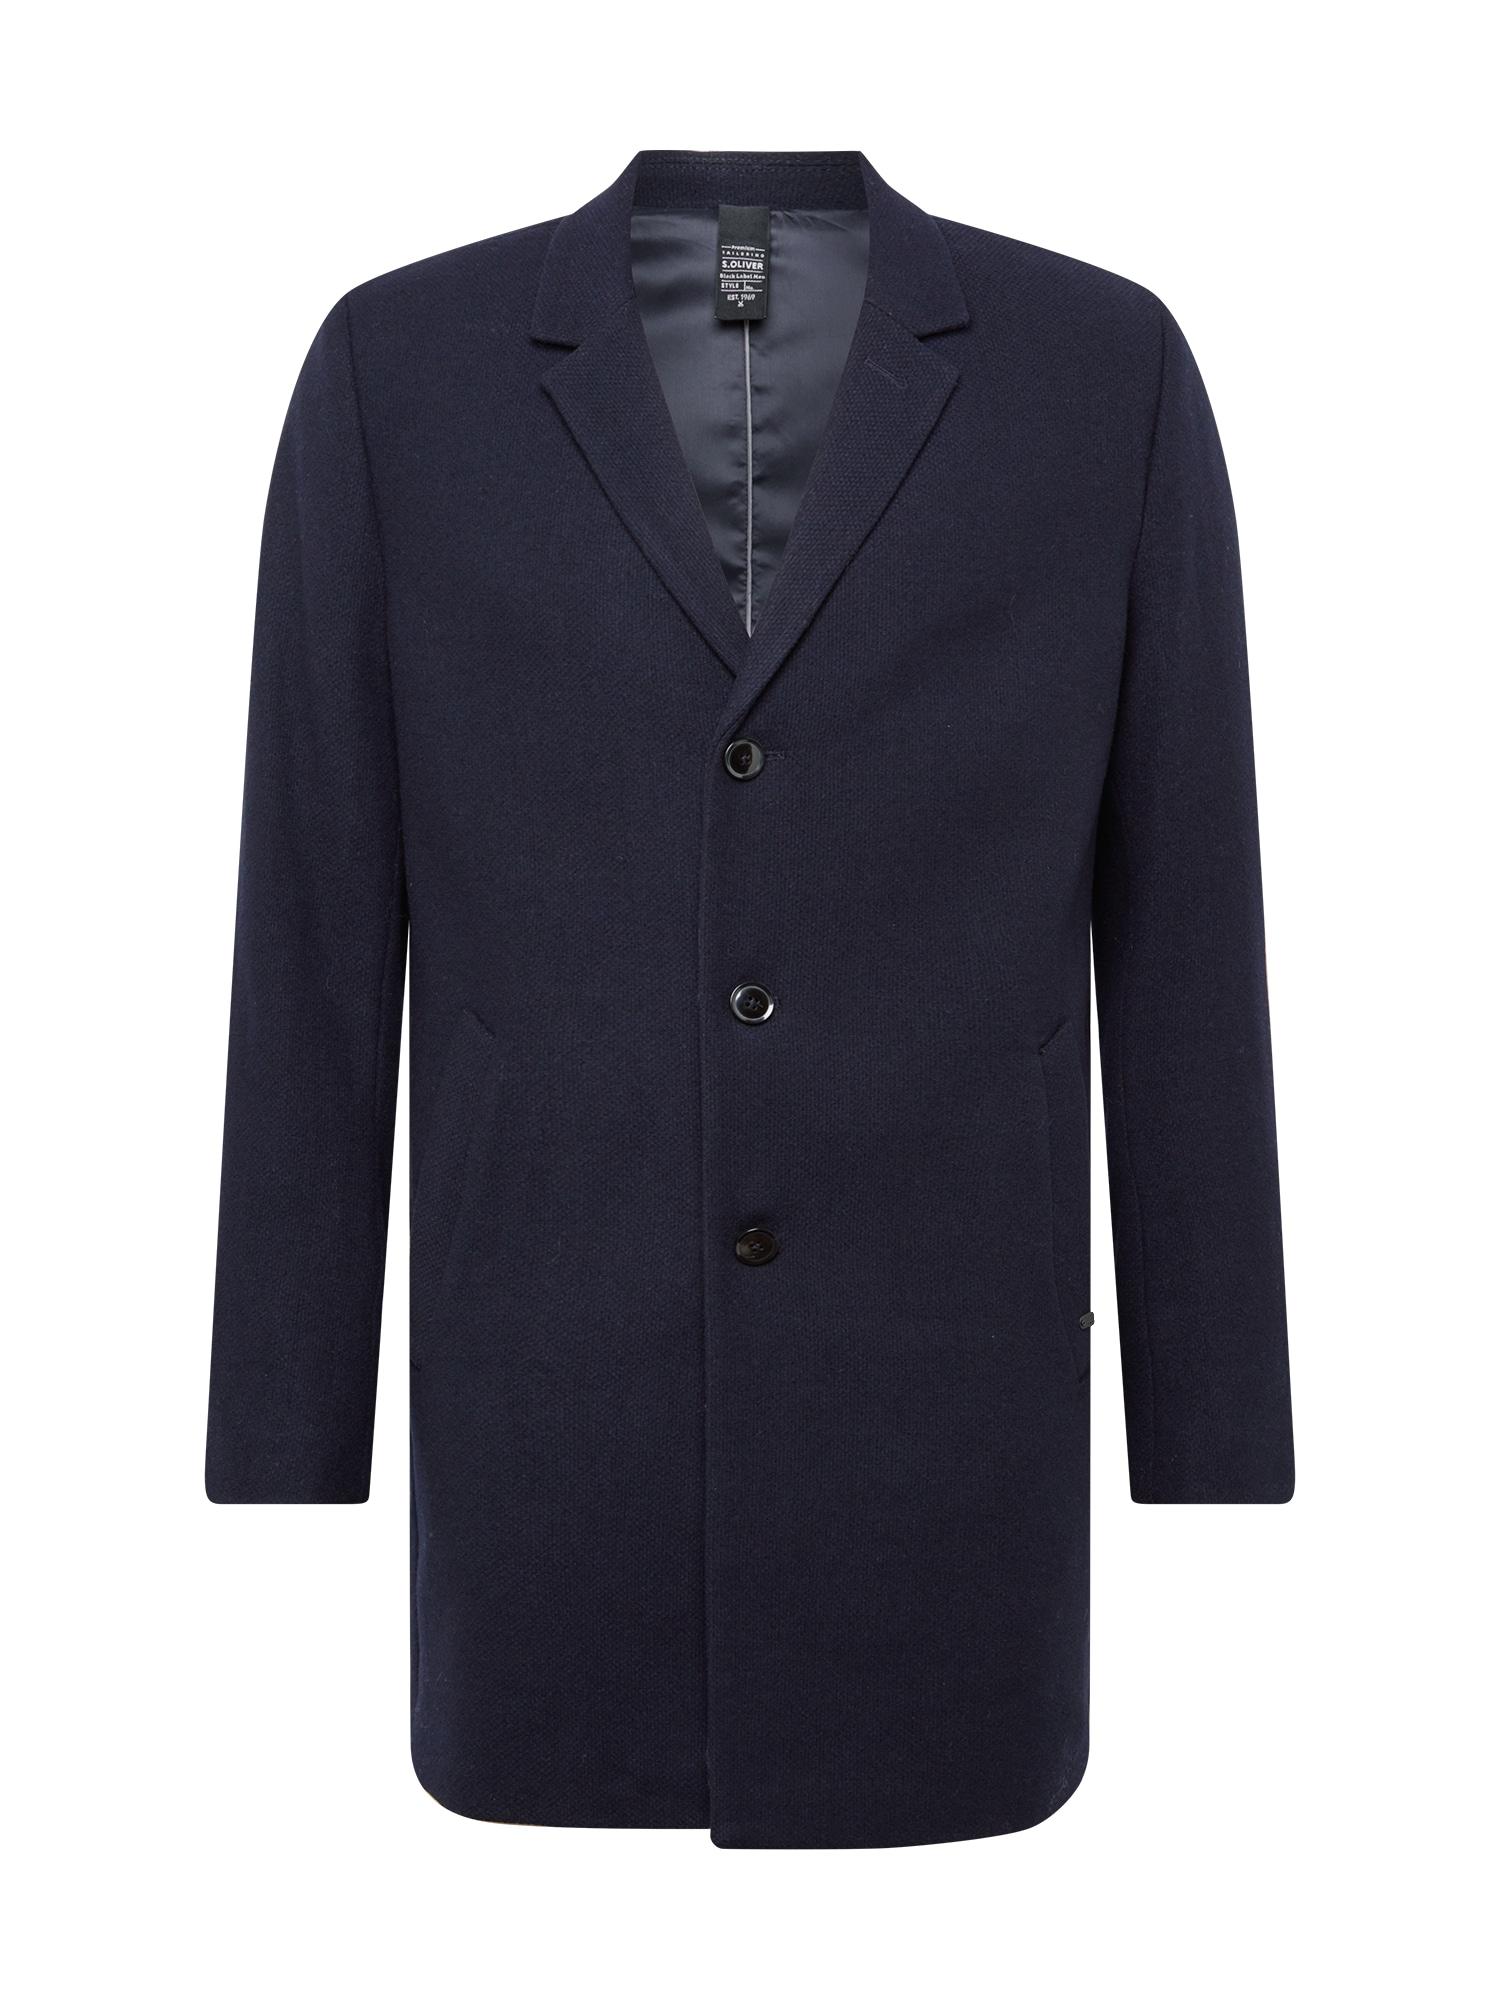 s.Oliver BLACK LABEL Demisezoninis paltas margai mėlyna